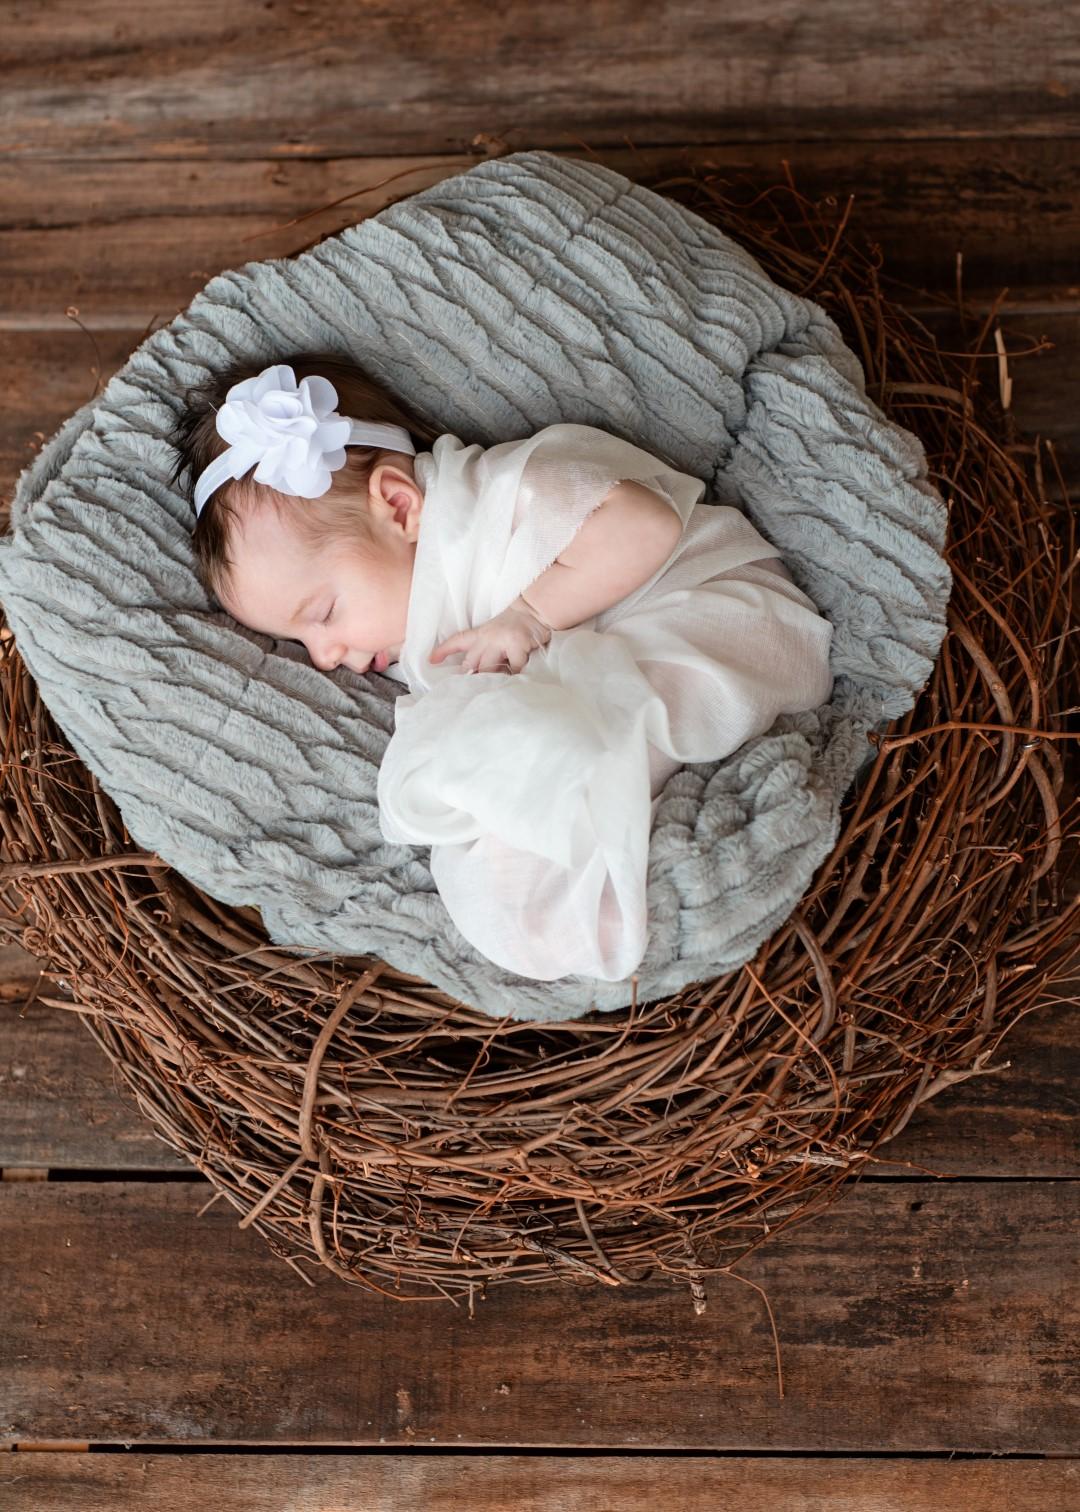 Cowen Baby 05 (Large).jpg